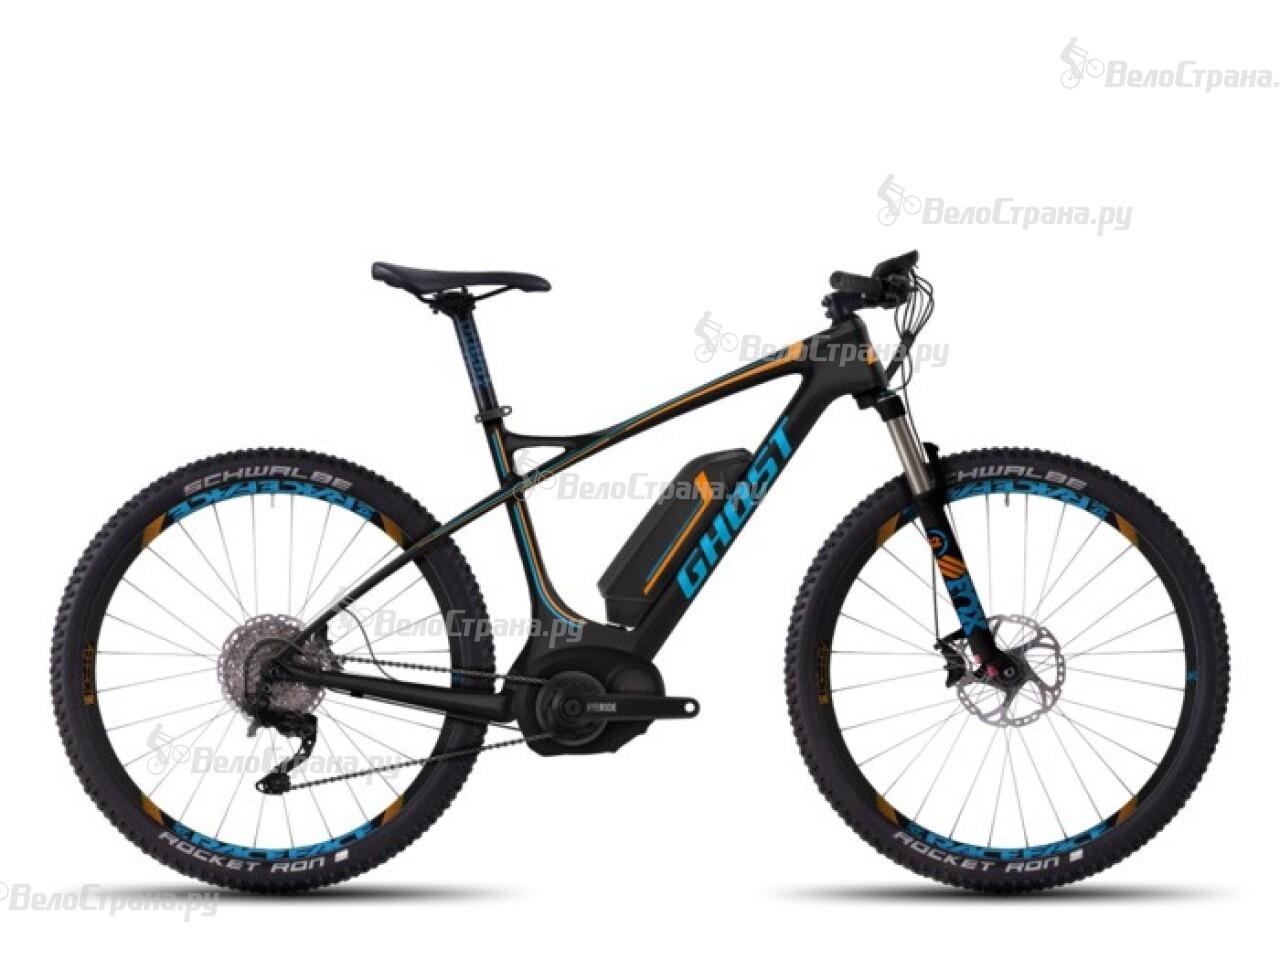 Велосипед Ghost Teru 9 LC (2016) велосипед ghost riot 9 lc 2015